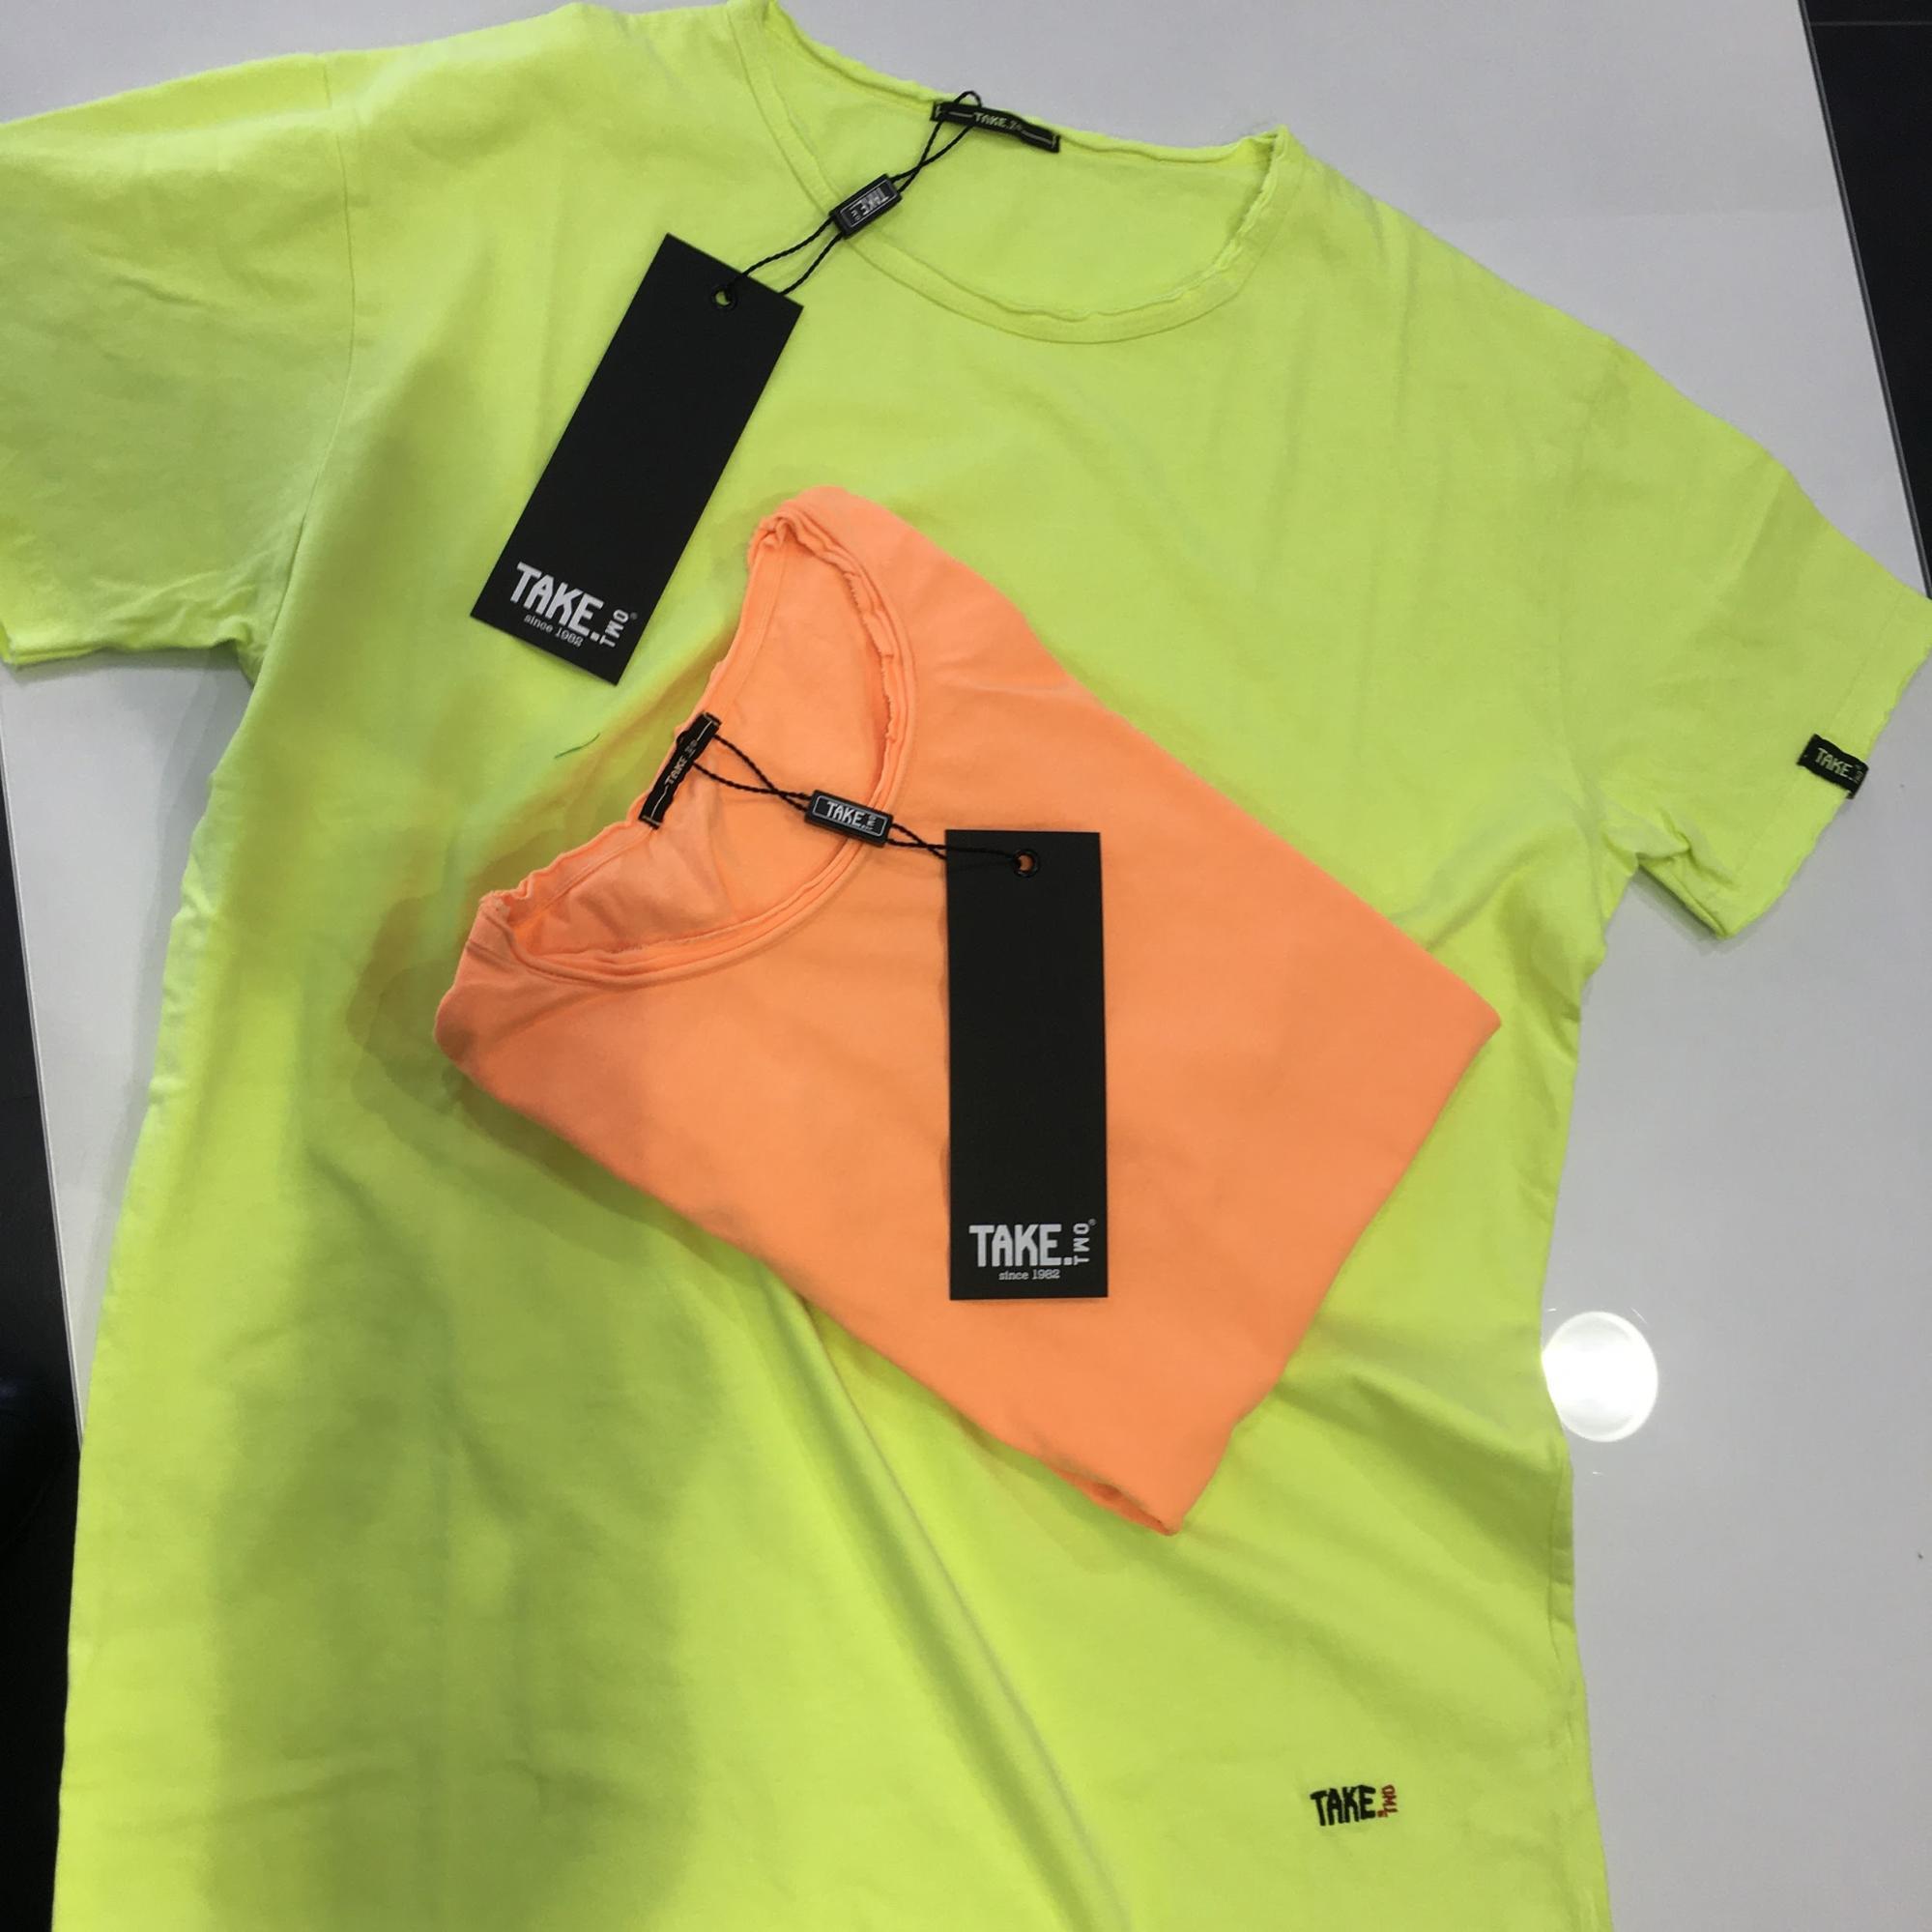 T-shirt fluo giallo e arancione take two uomo